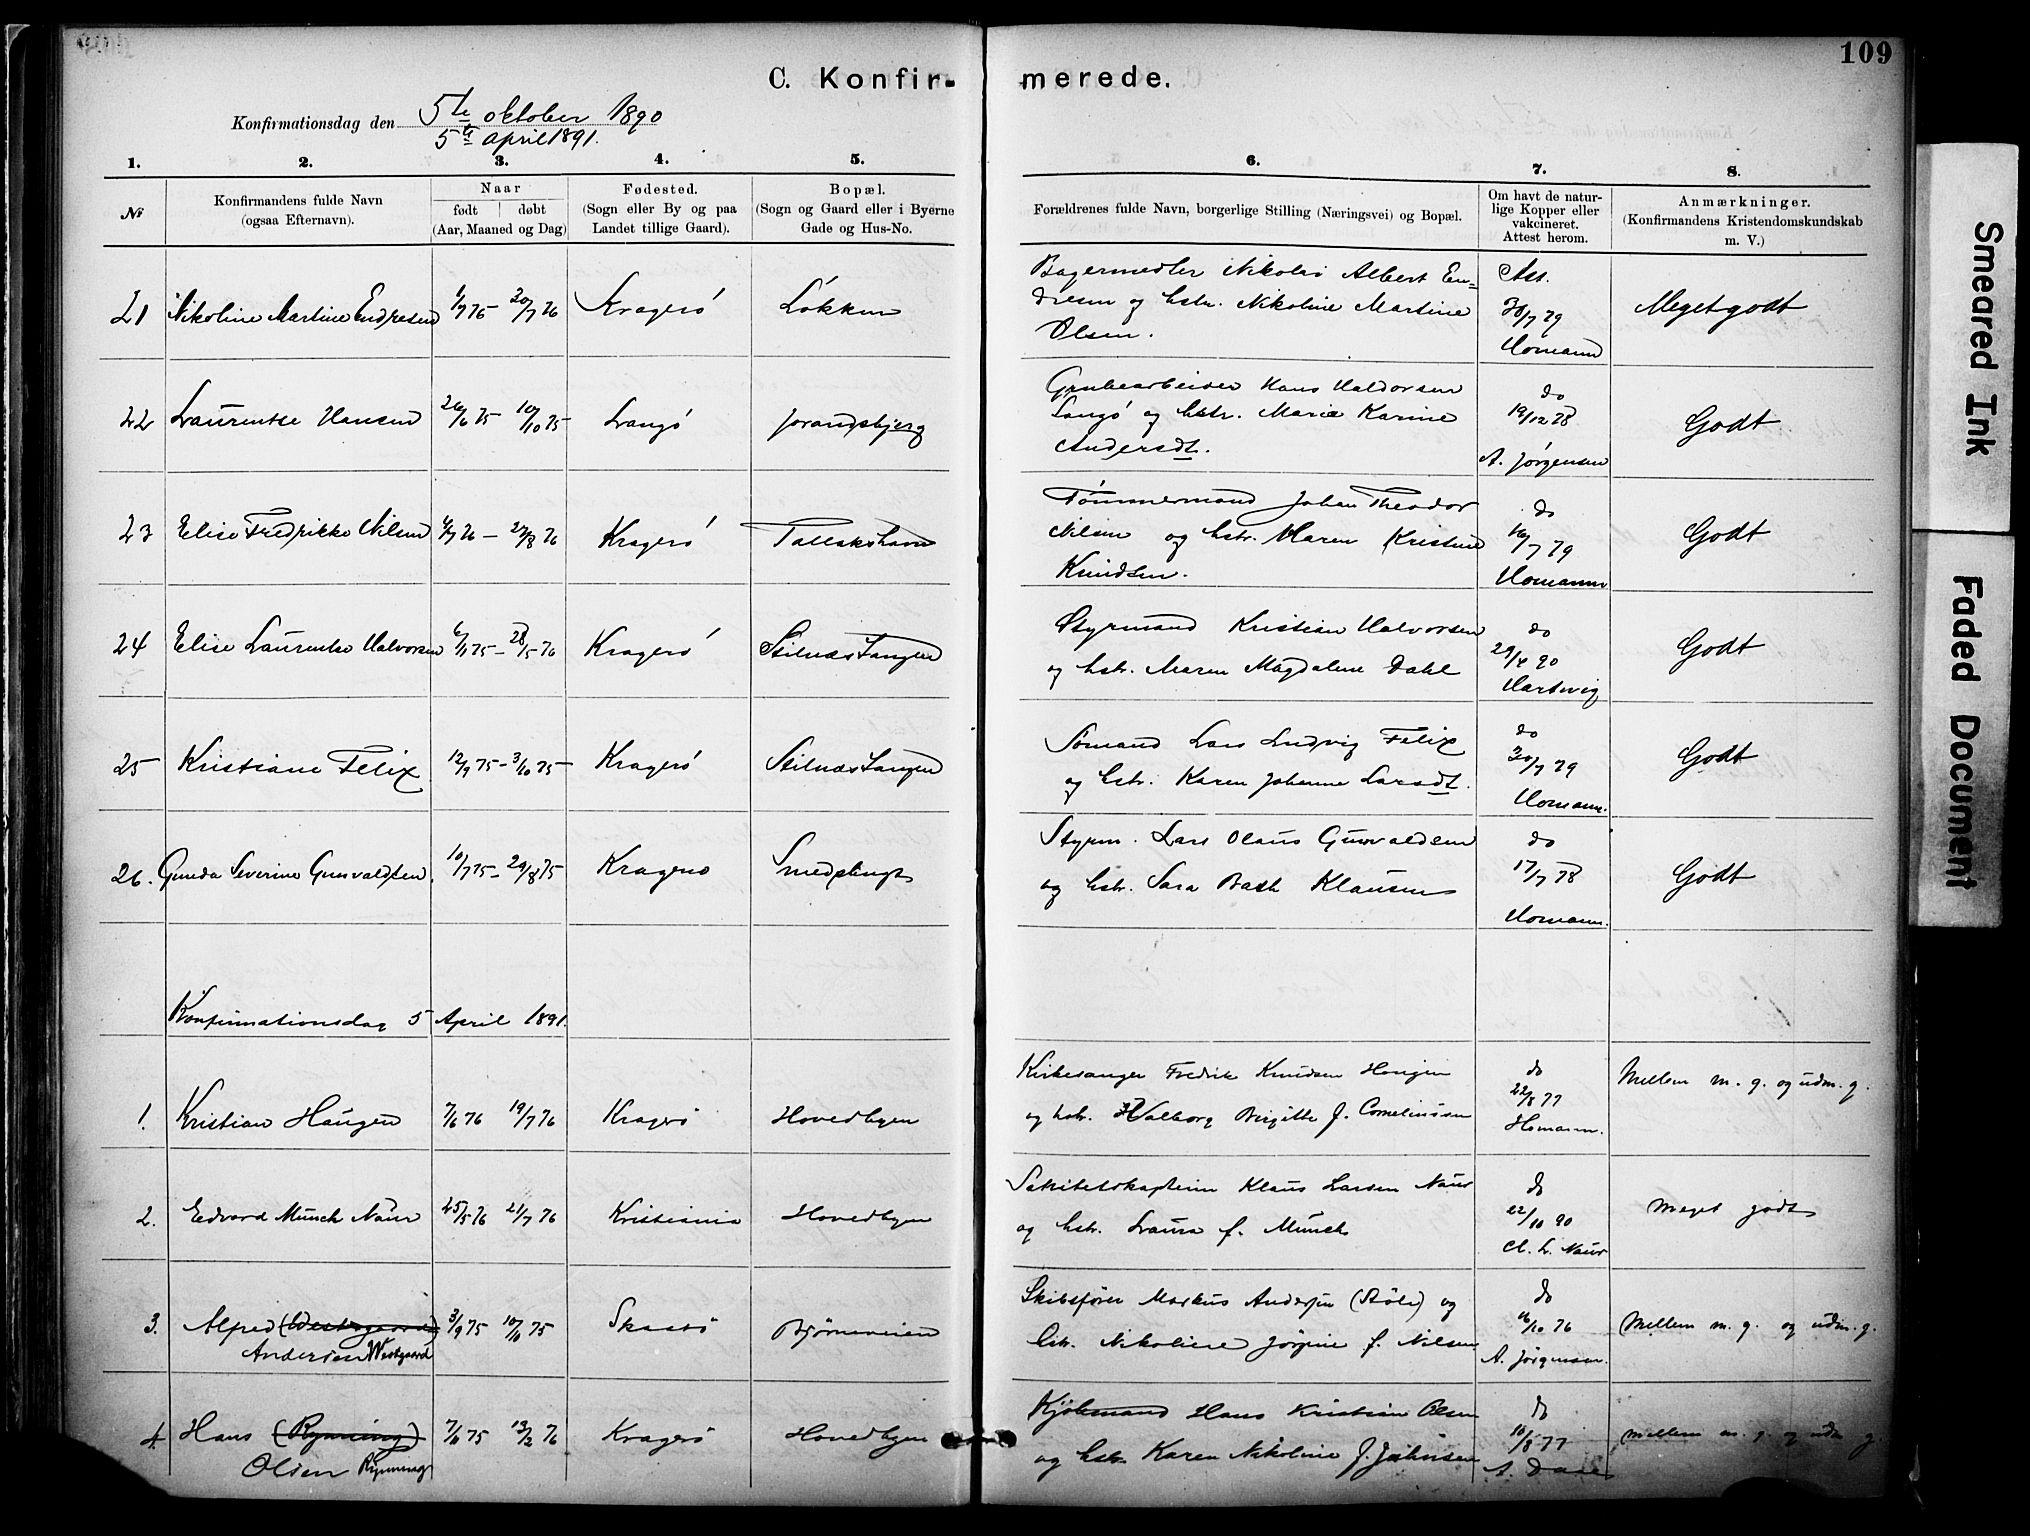 SAKO, Kragerø kirkebøker, F/Fa/L0012: Ministerialbok nr. I 12, 1880-1904, s. 109